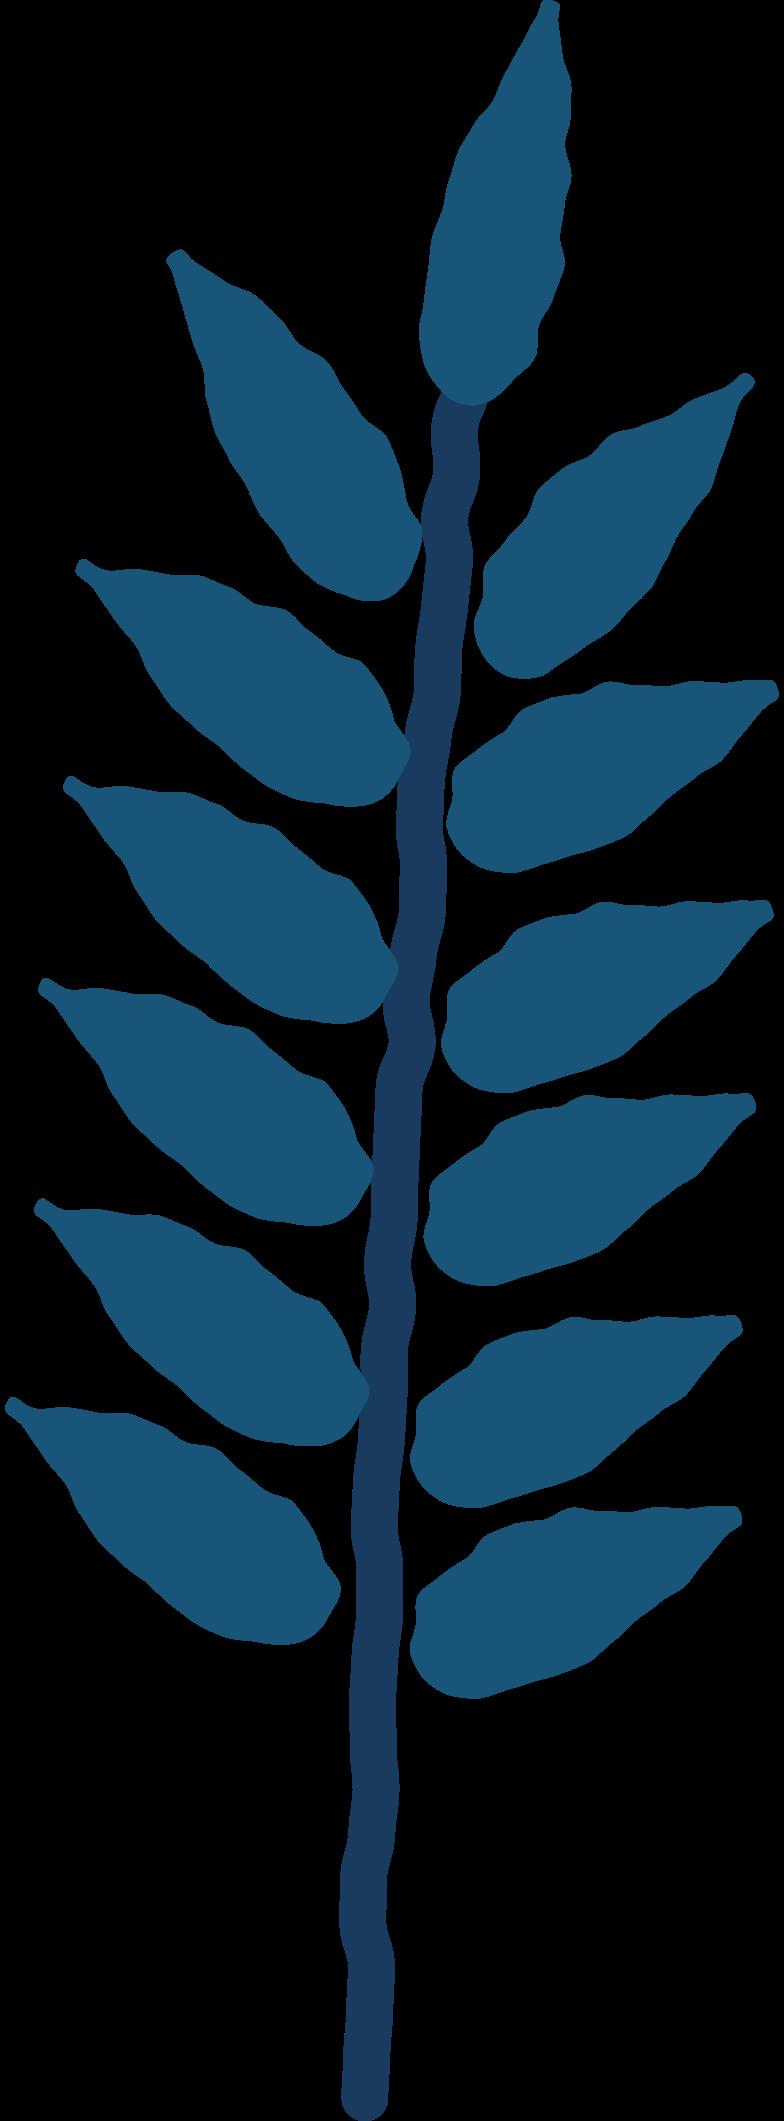 rowan leaf Clipart illustration in PNG, SVG